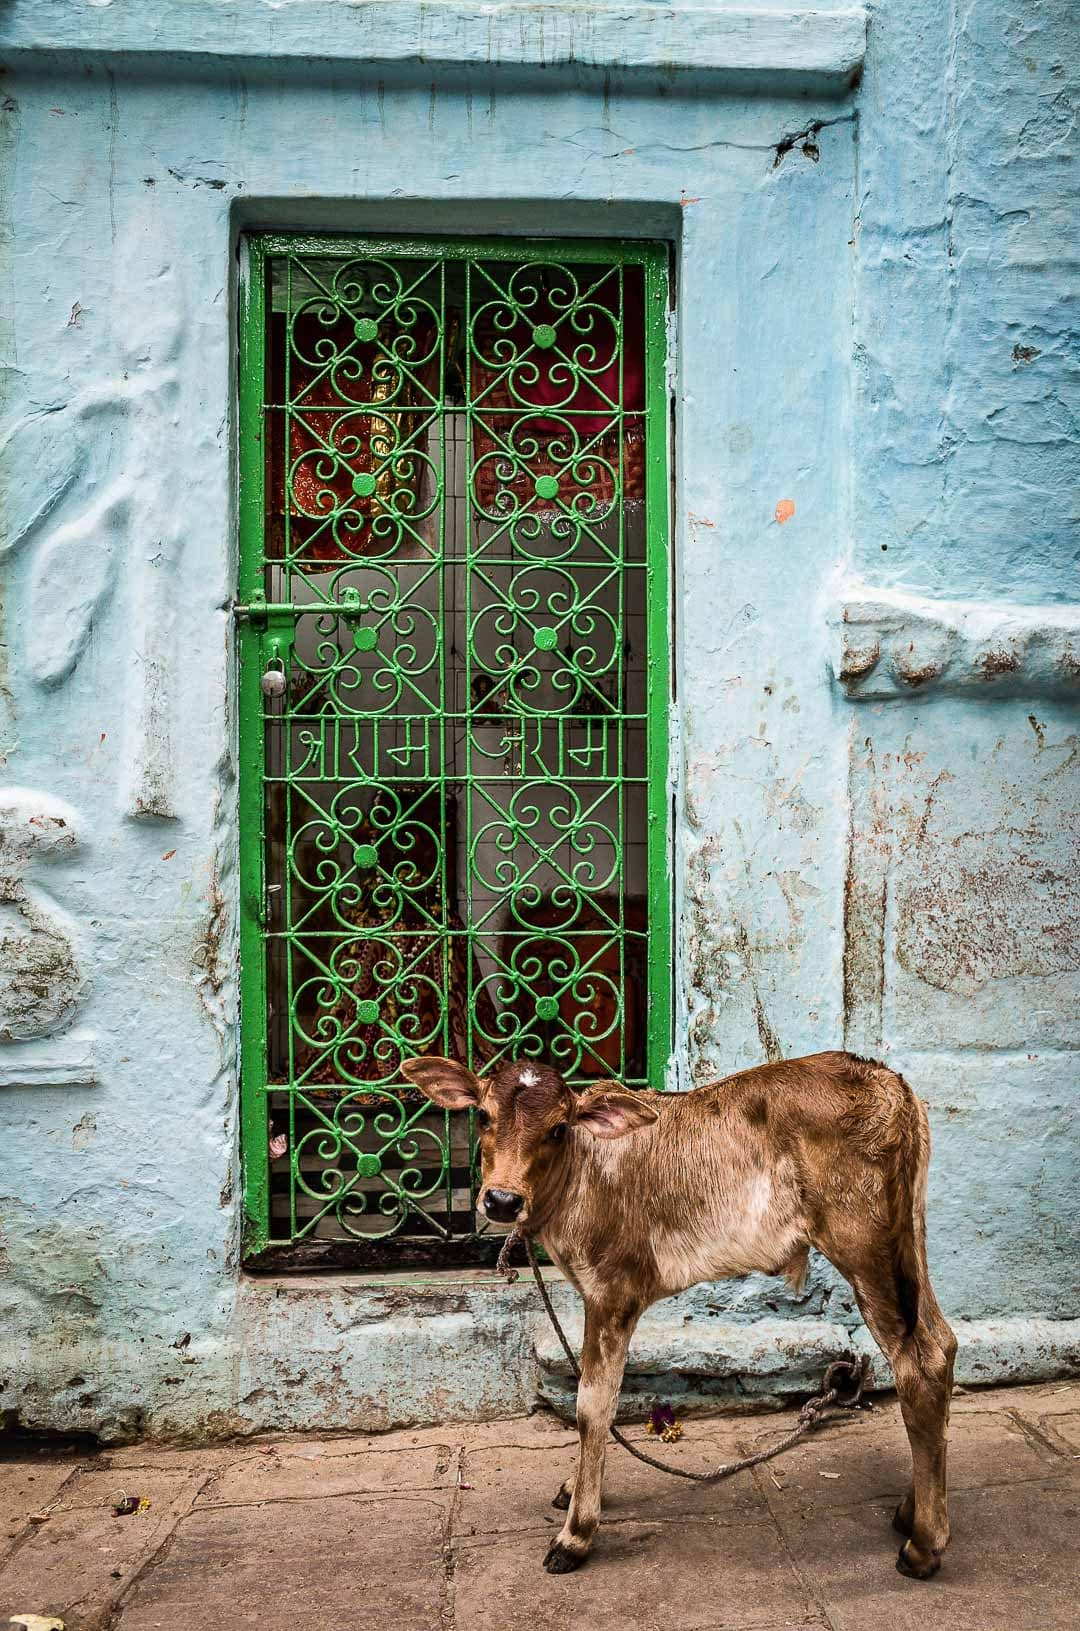 A baby calf in Varanasi India near an alley door